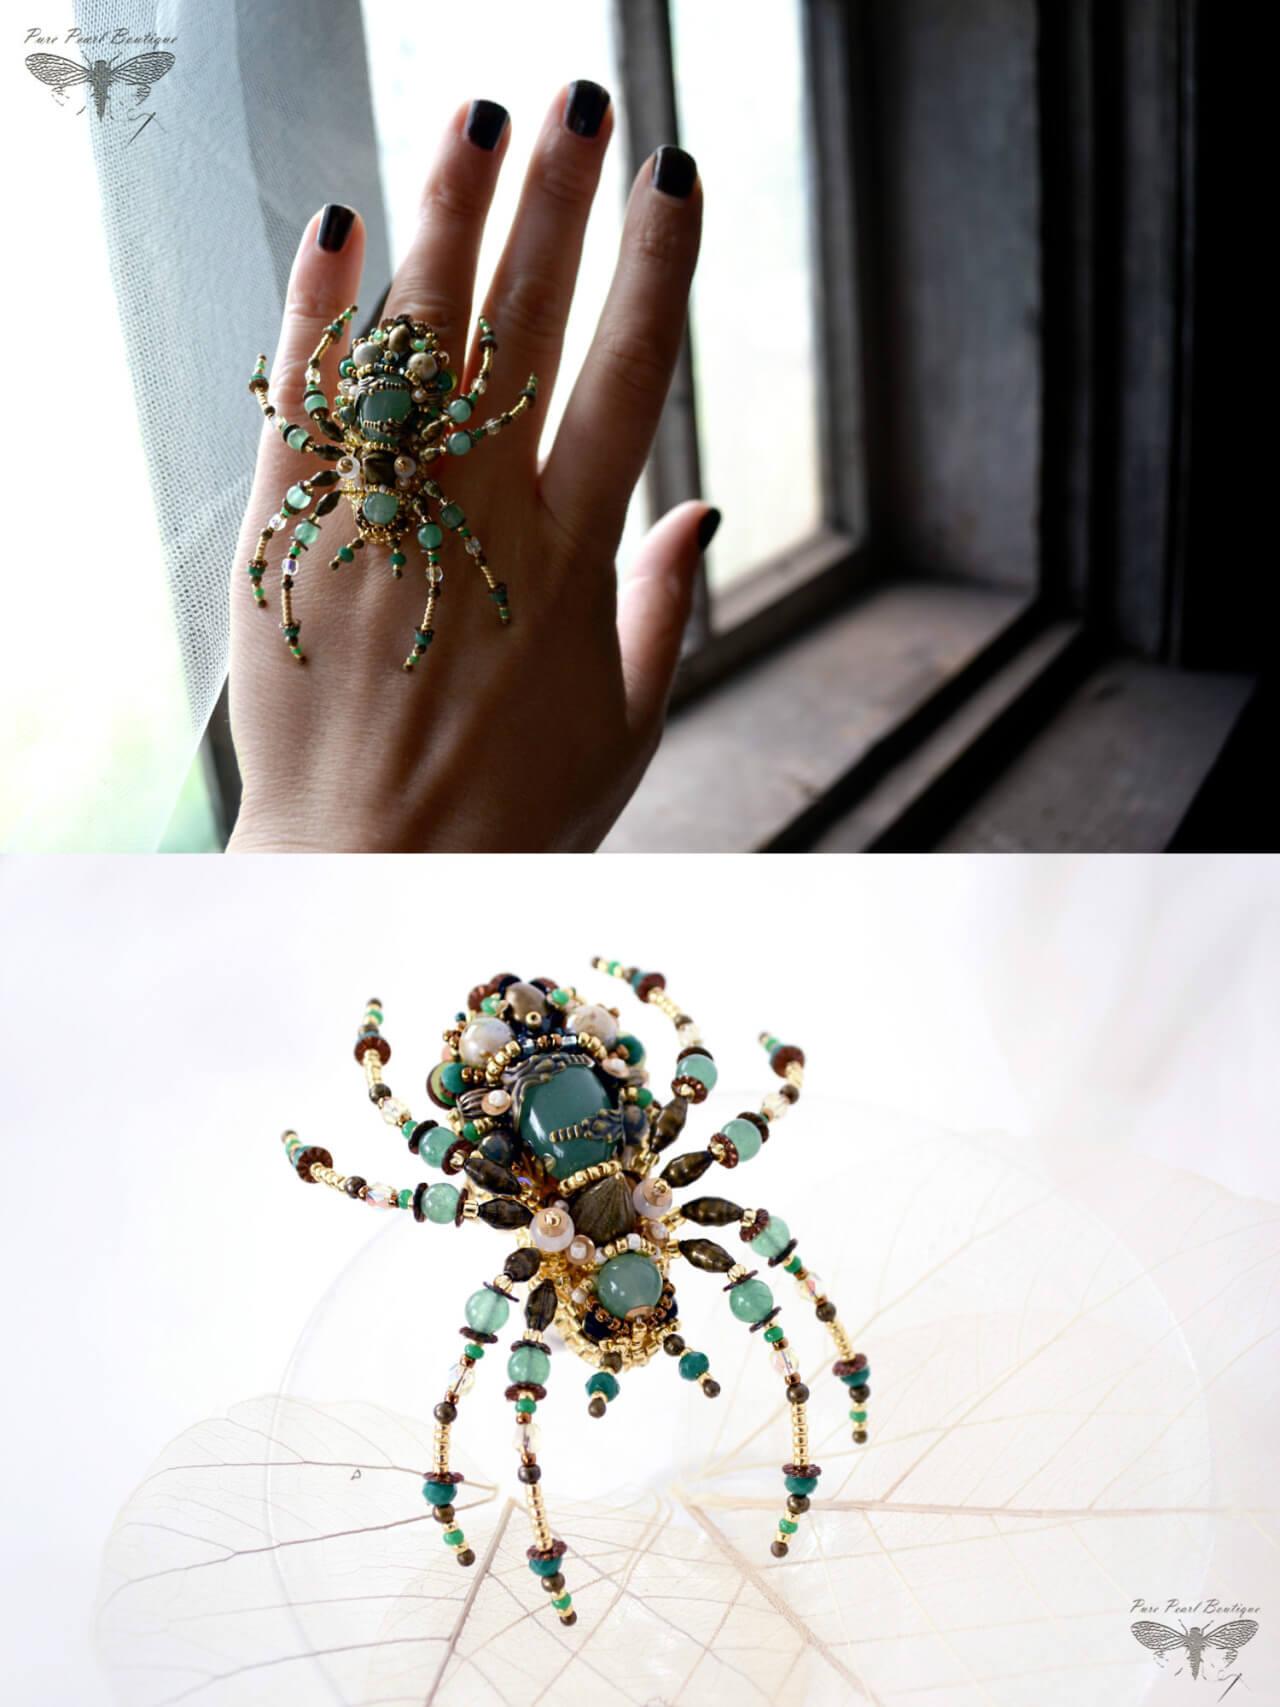 Spider Jewelry 5 (1)